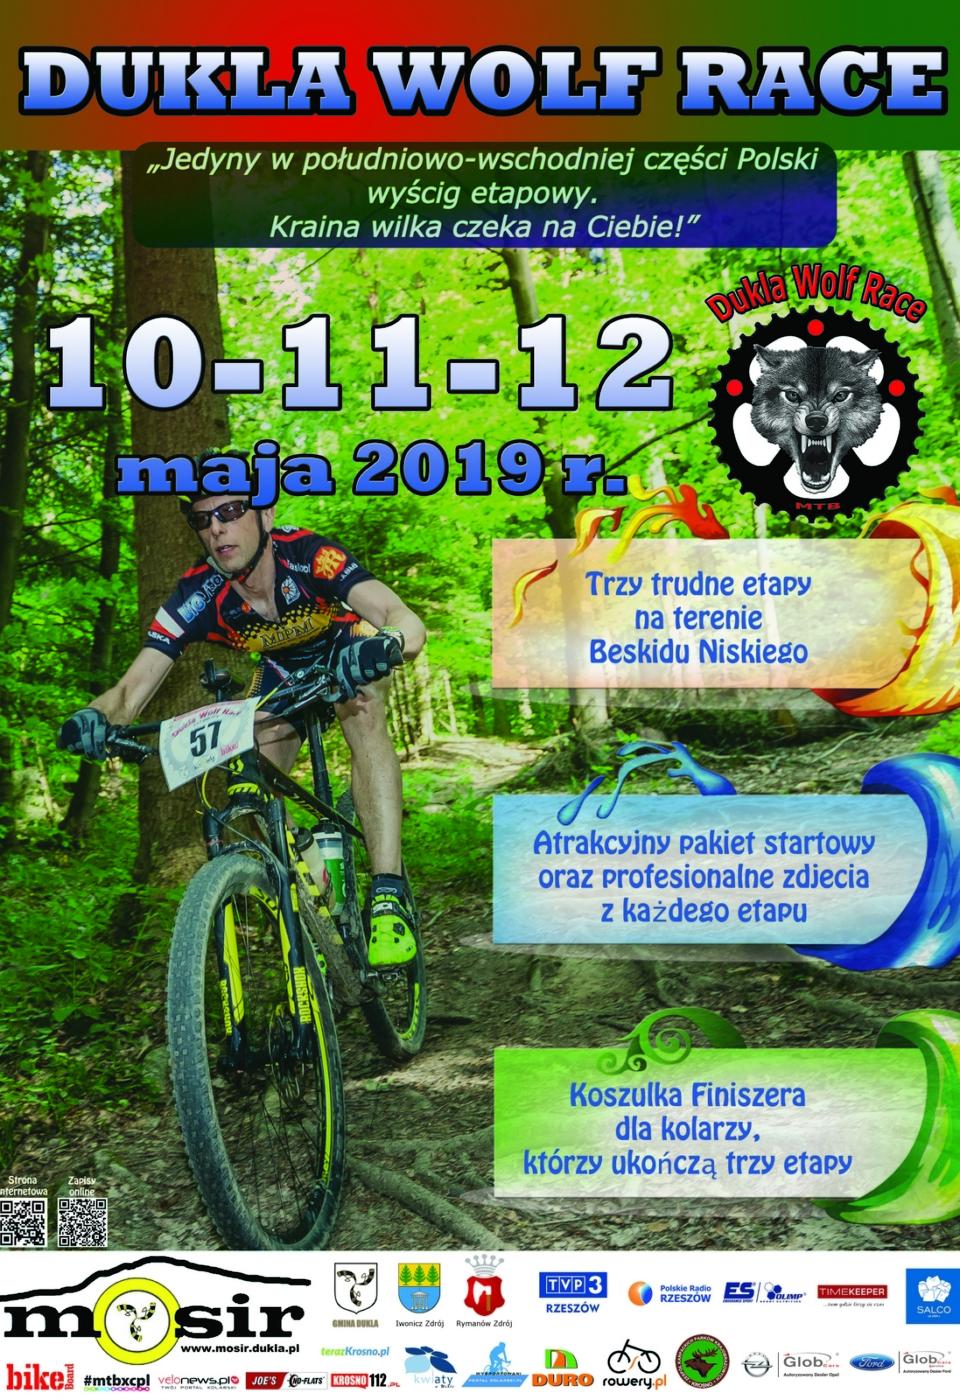 Dukla Wolf Race 2019m